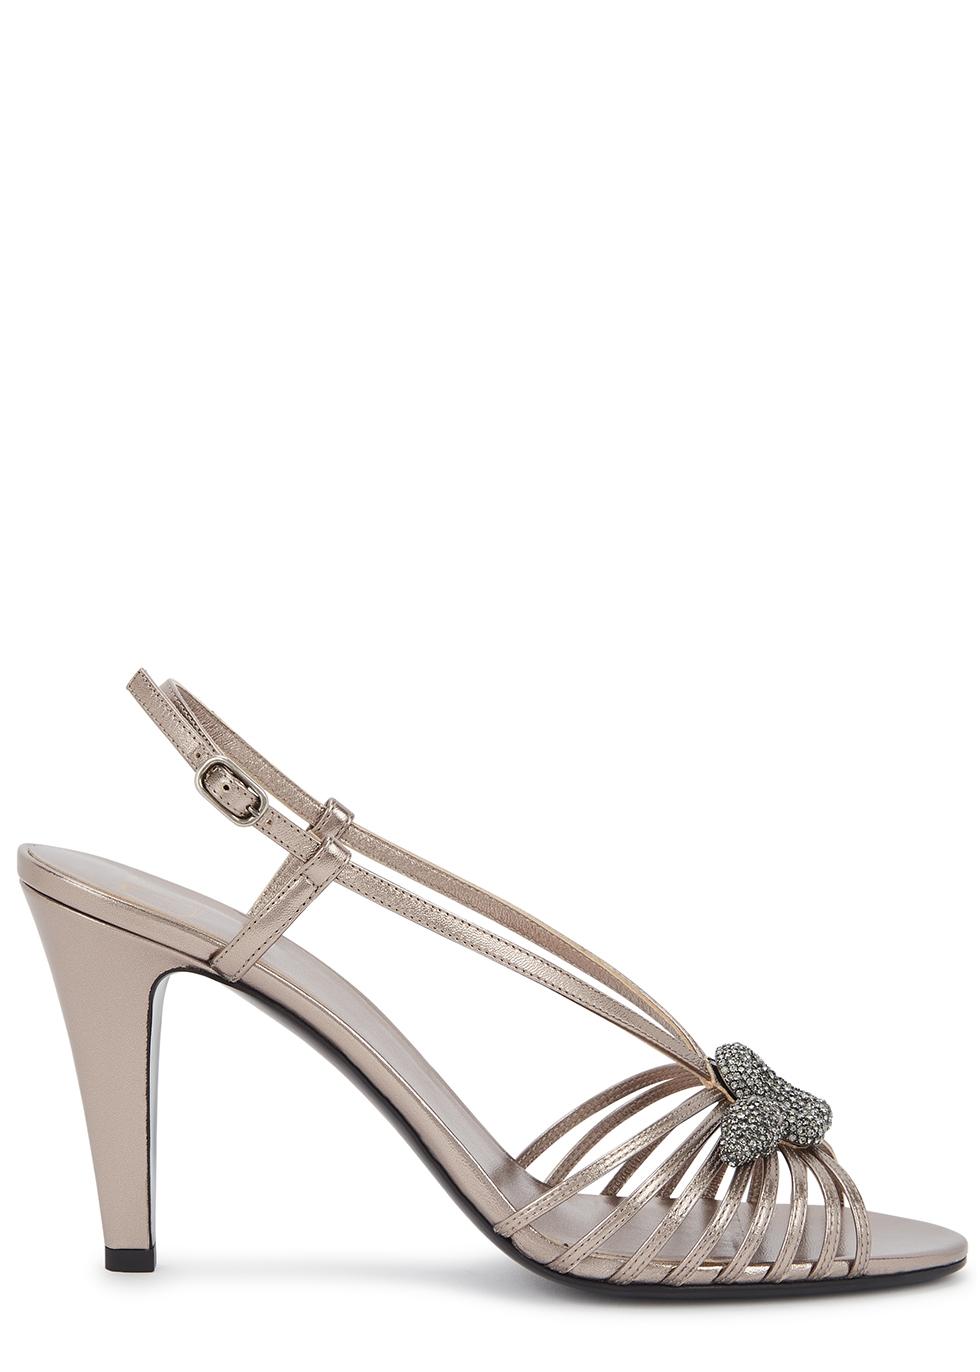 Valentino Garavani Strass Maison 90 leather sandals